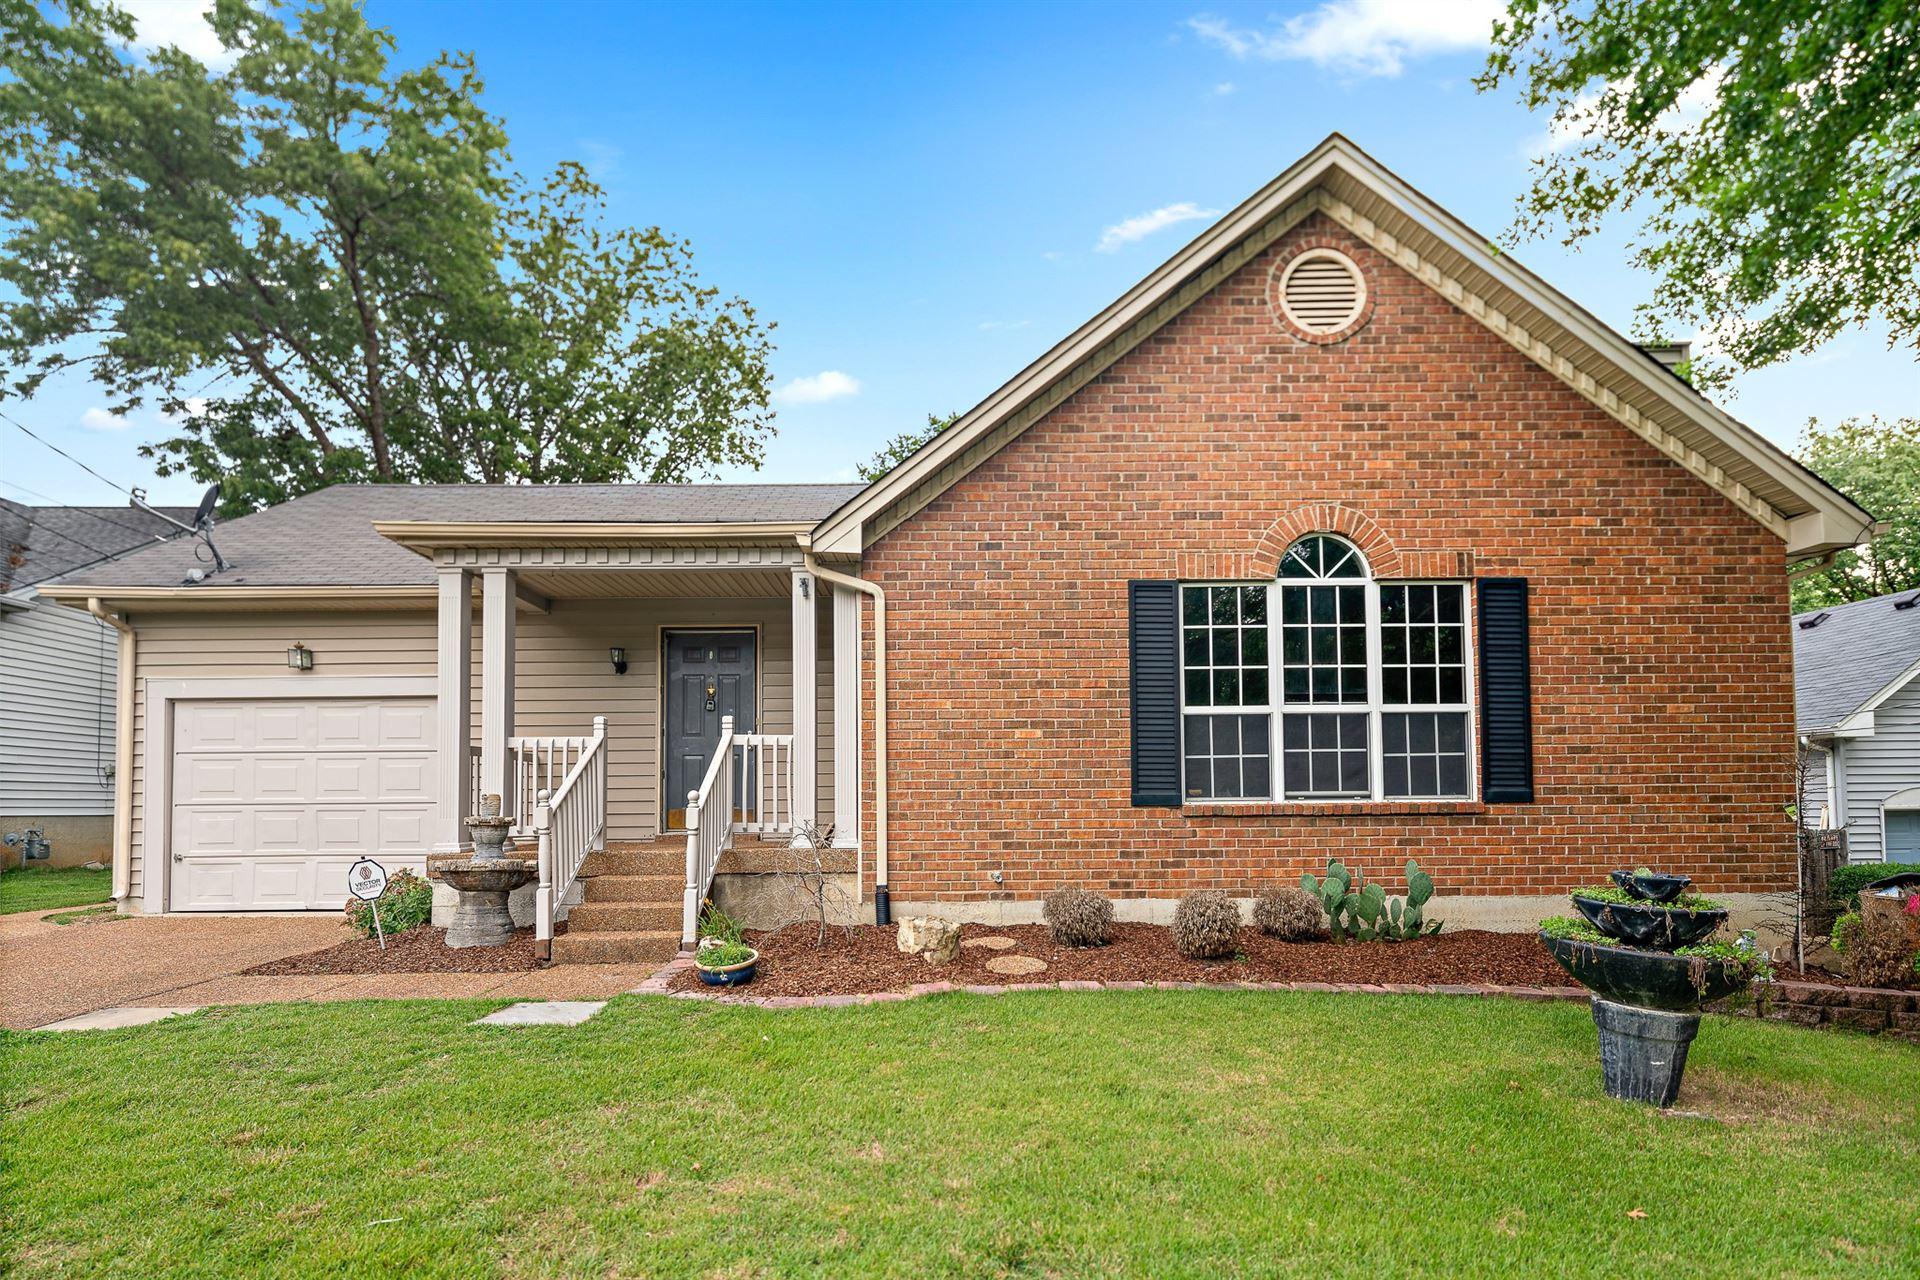 1217 Huntingboro Ct, Antioch, TN 37013 - MLS#: 2174028